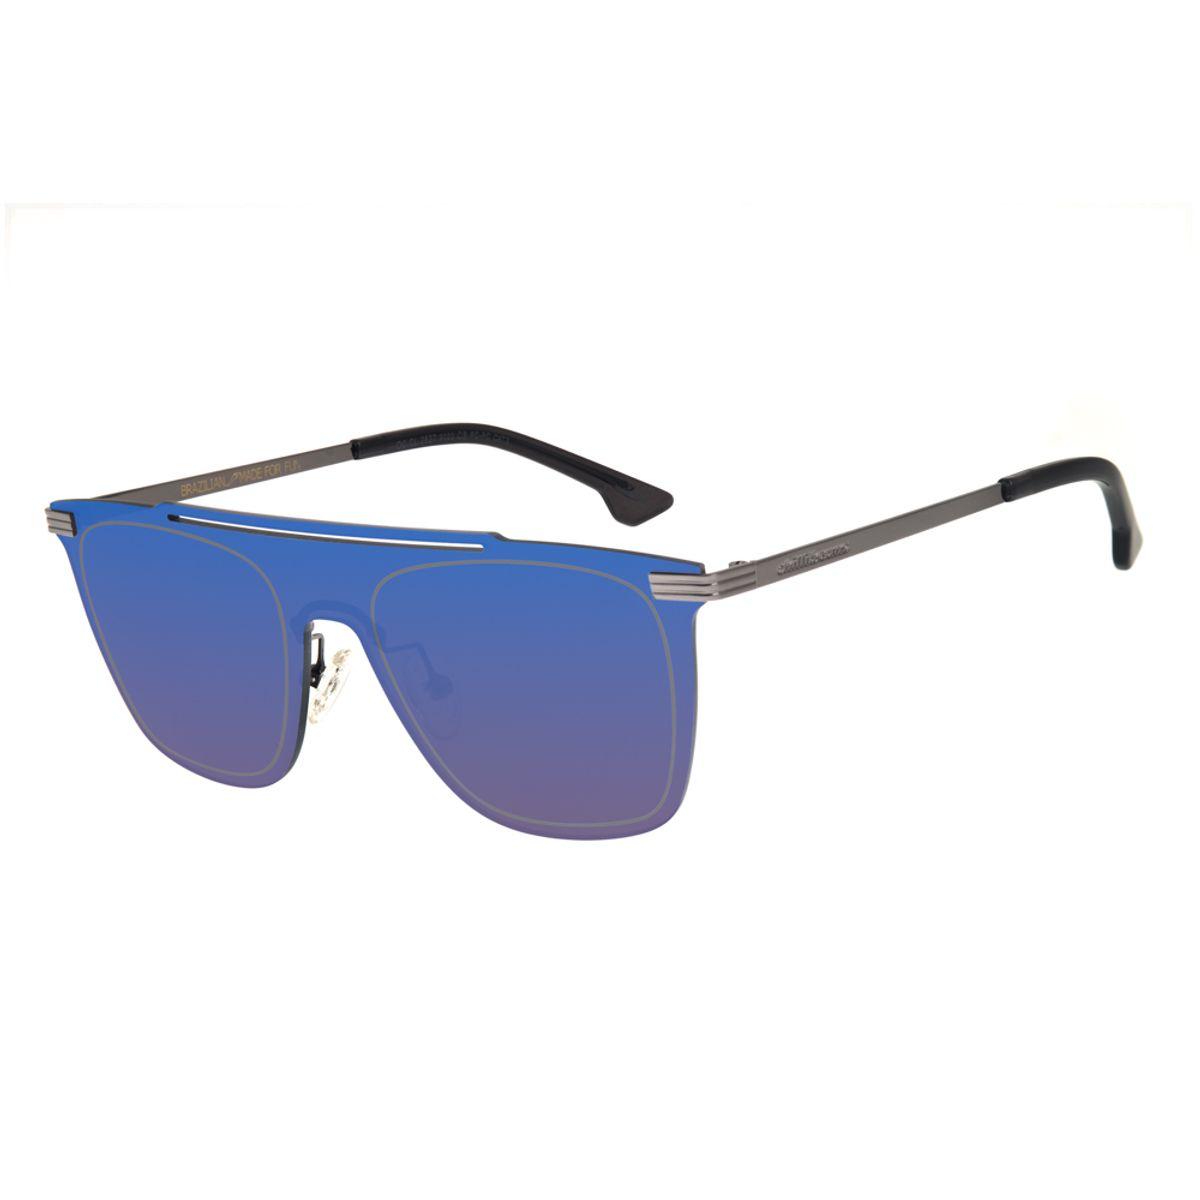 f5bdbef1f Óculos de Sol Chilli Beans Masculino Máscara Espelhado Azul - Chilli ...